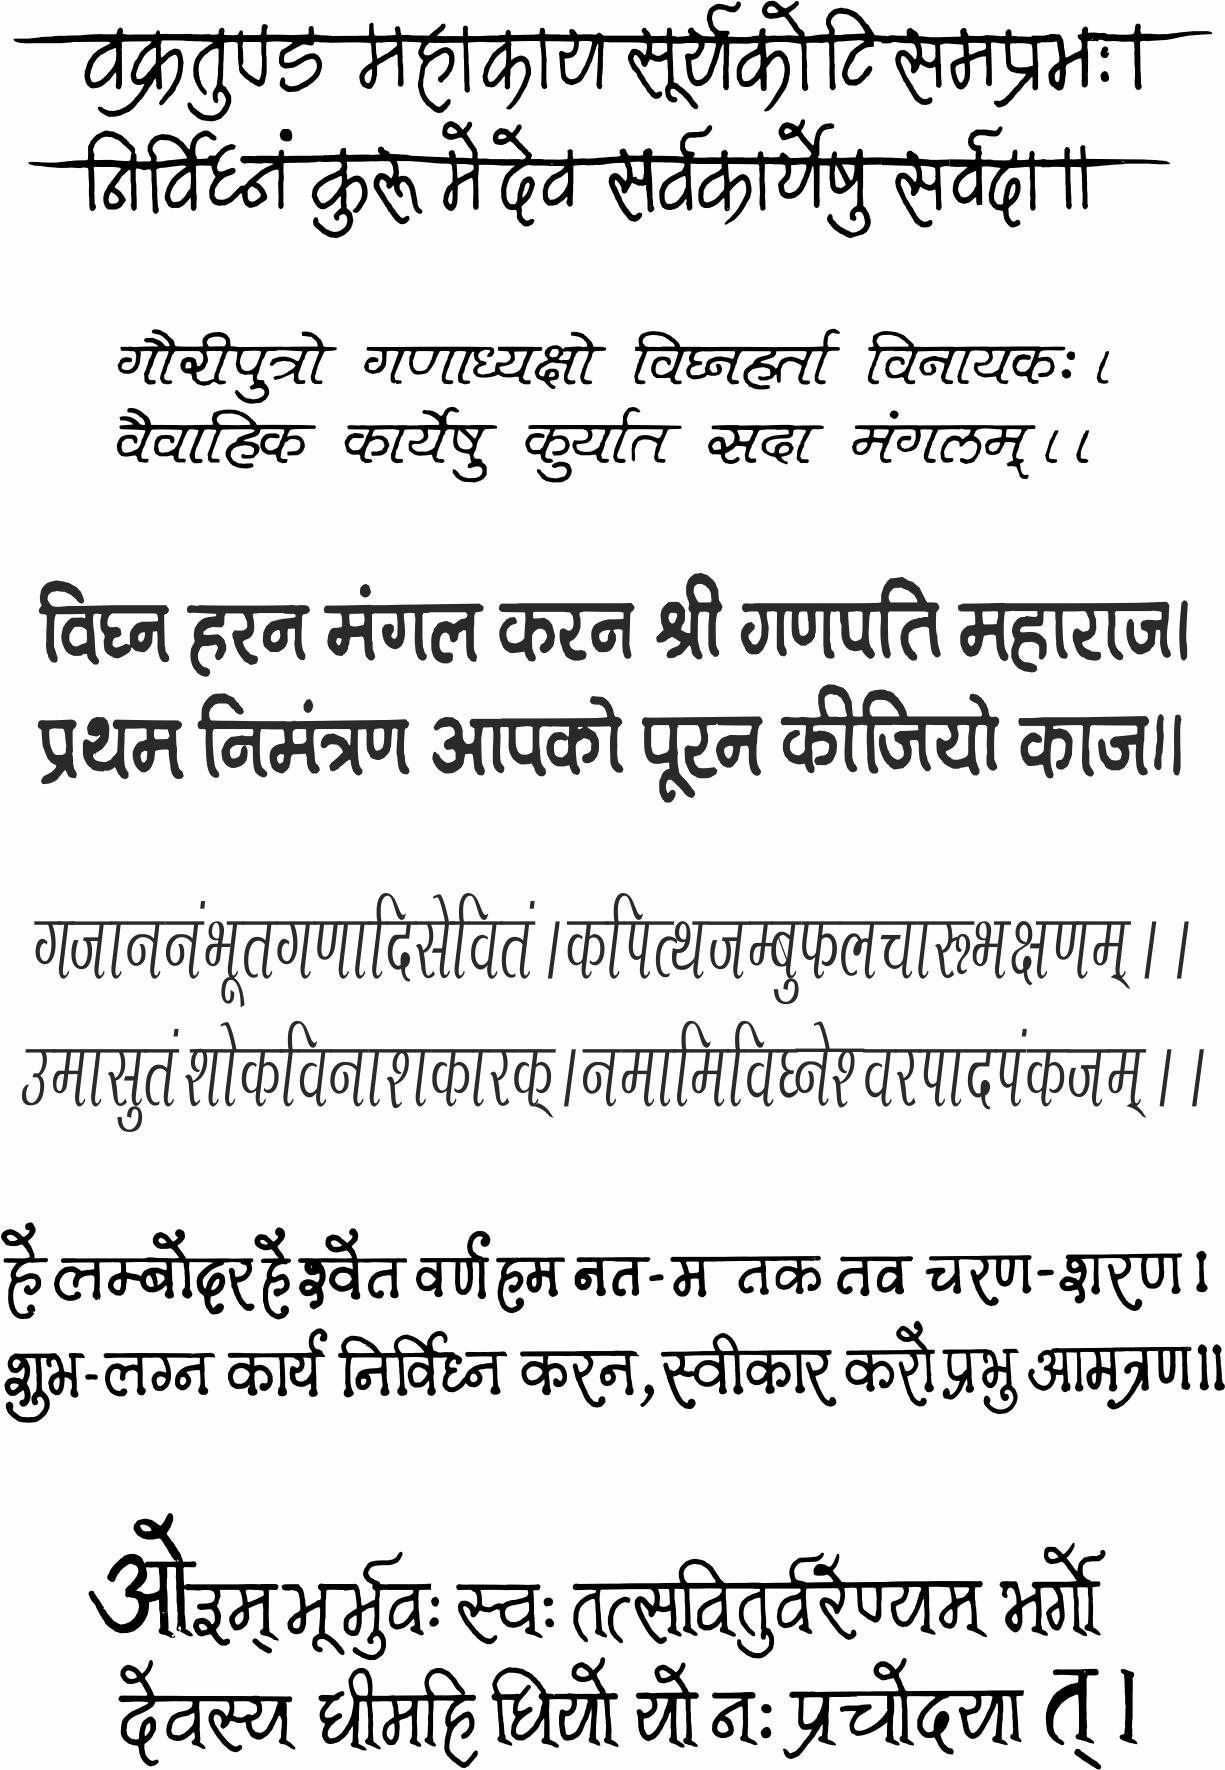 Can You Suggest A Sanskrit Shloka For Wedding Invitation Quora